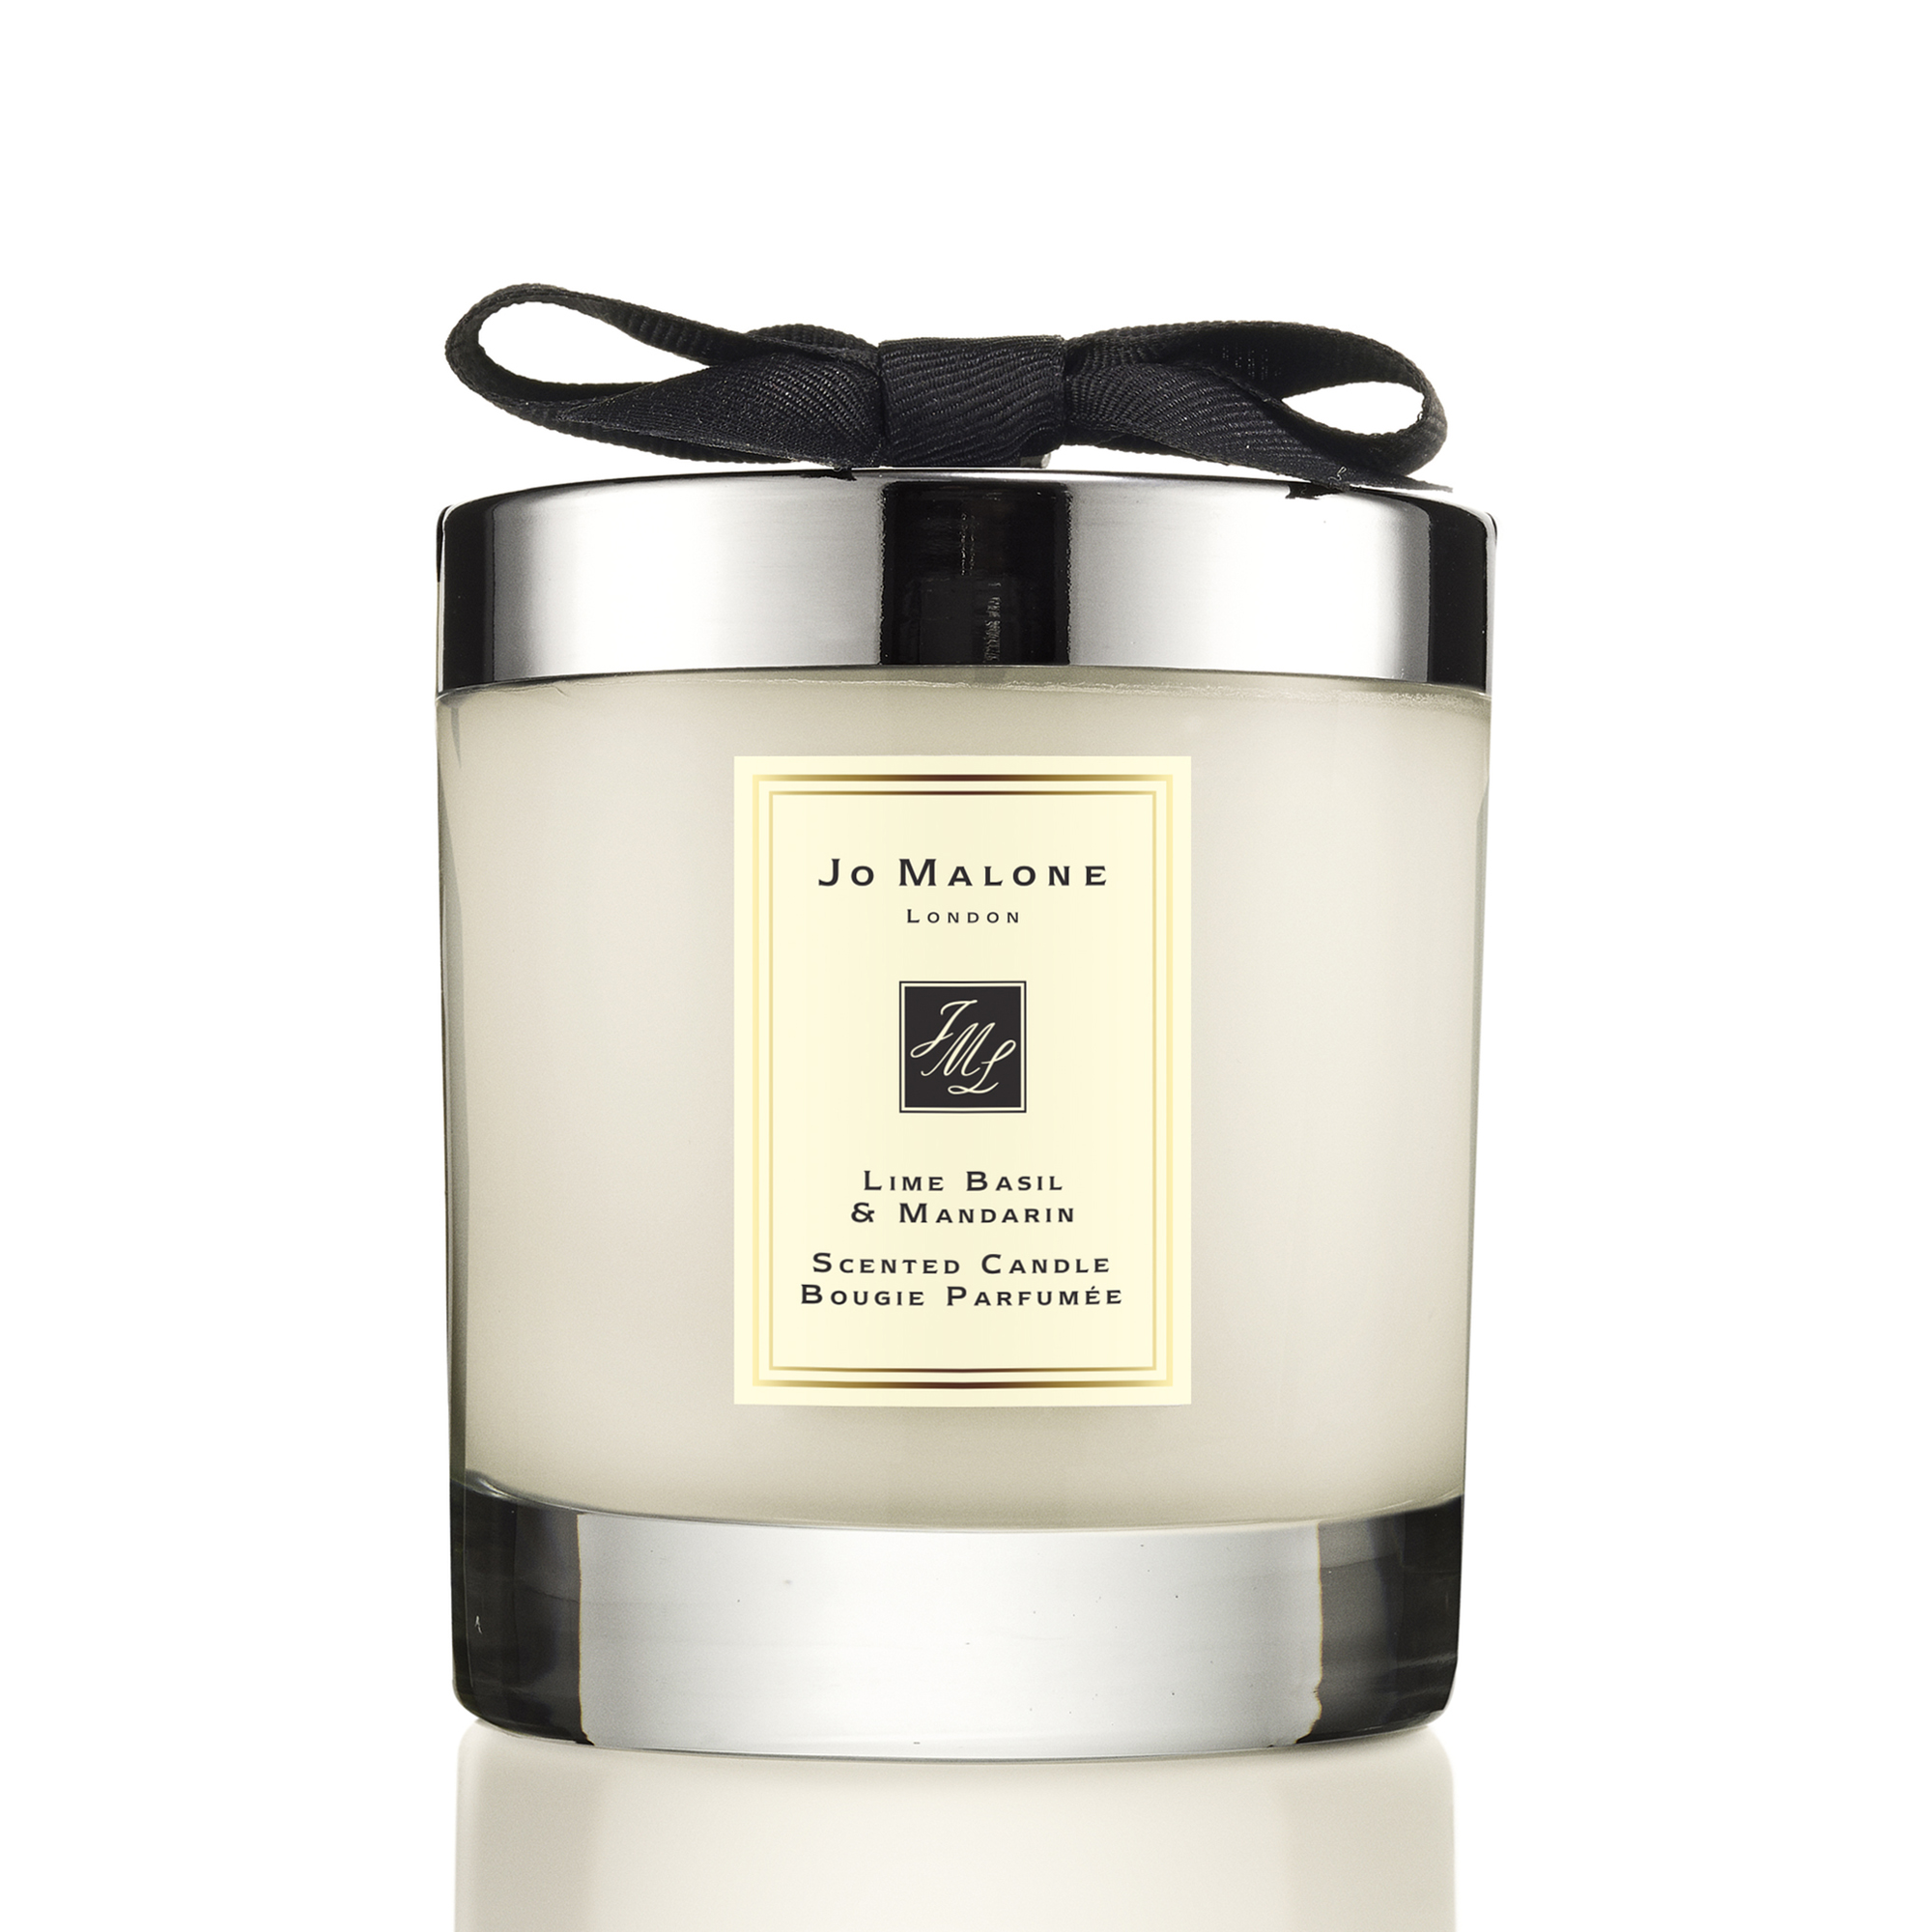 Lime Basil & Mandarin Home Candle 200g